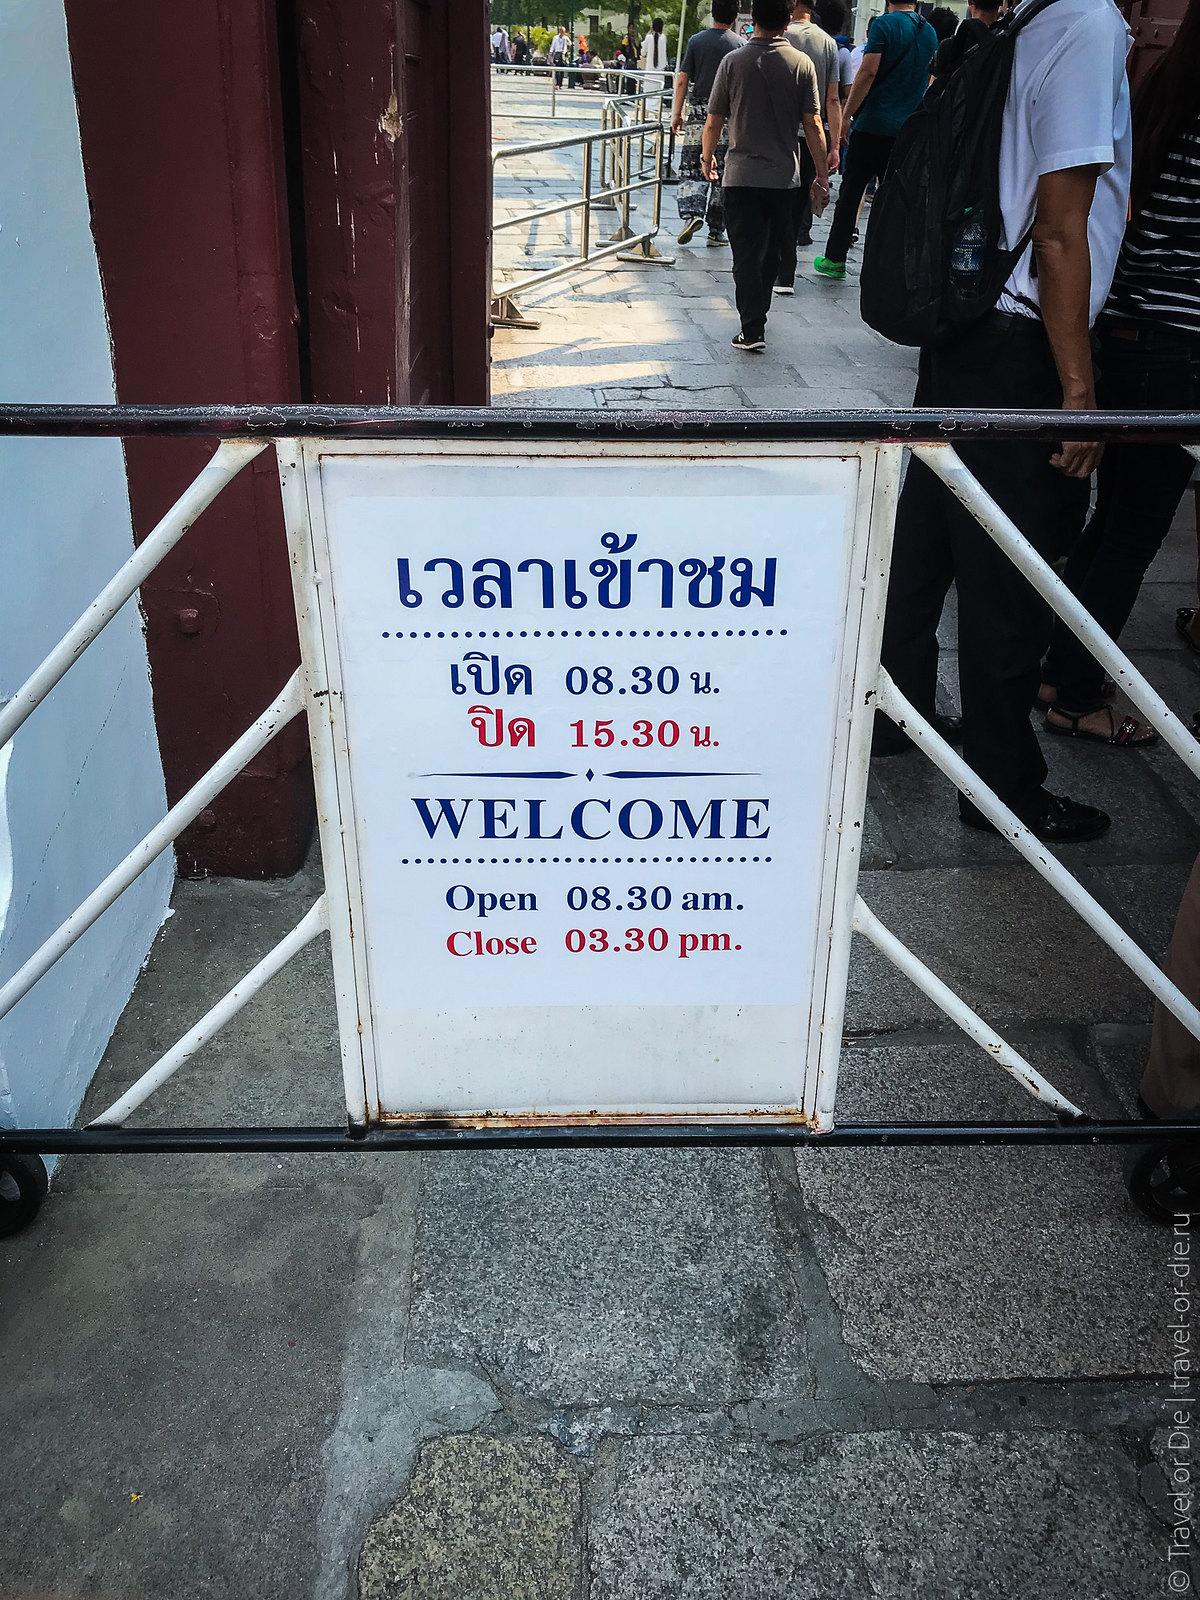 Grand-Palace-Bangkok-Королевский-дворец-Бангкок-9163